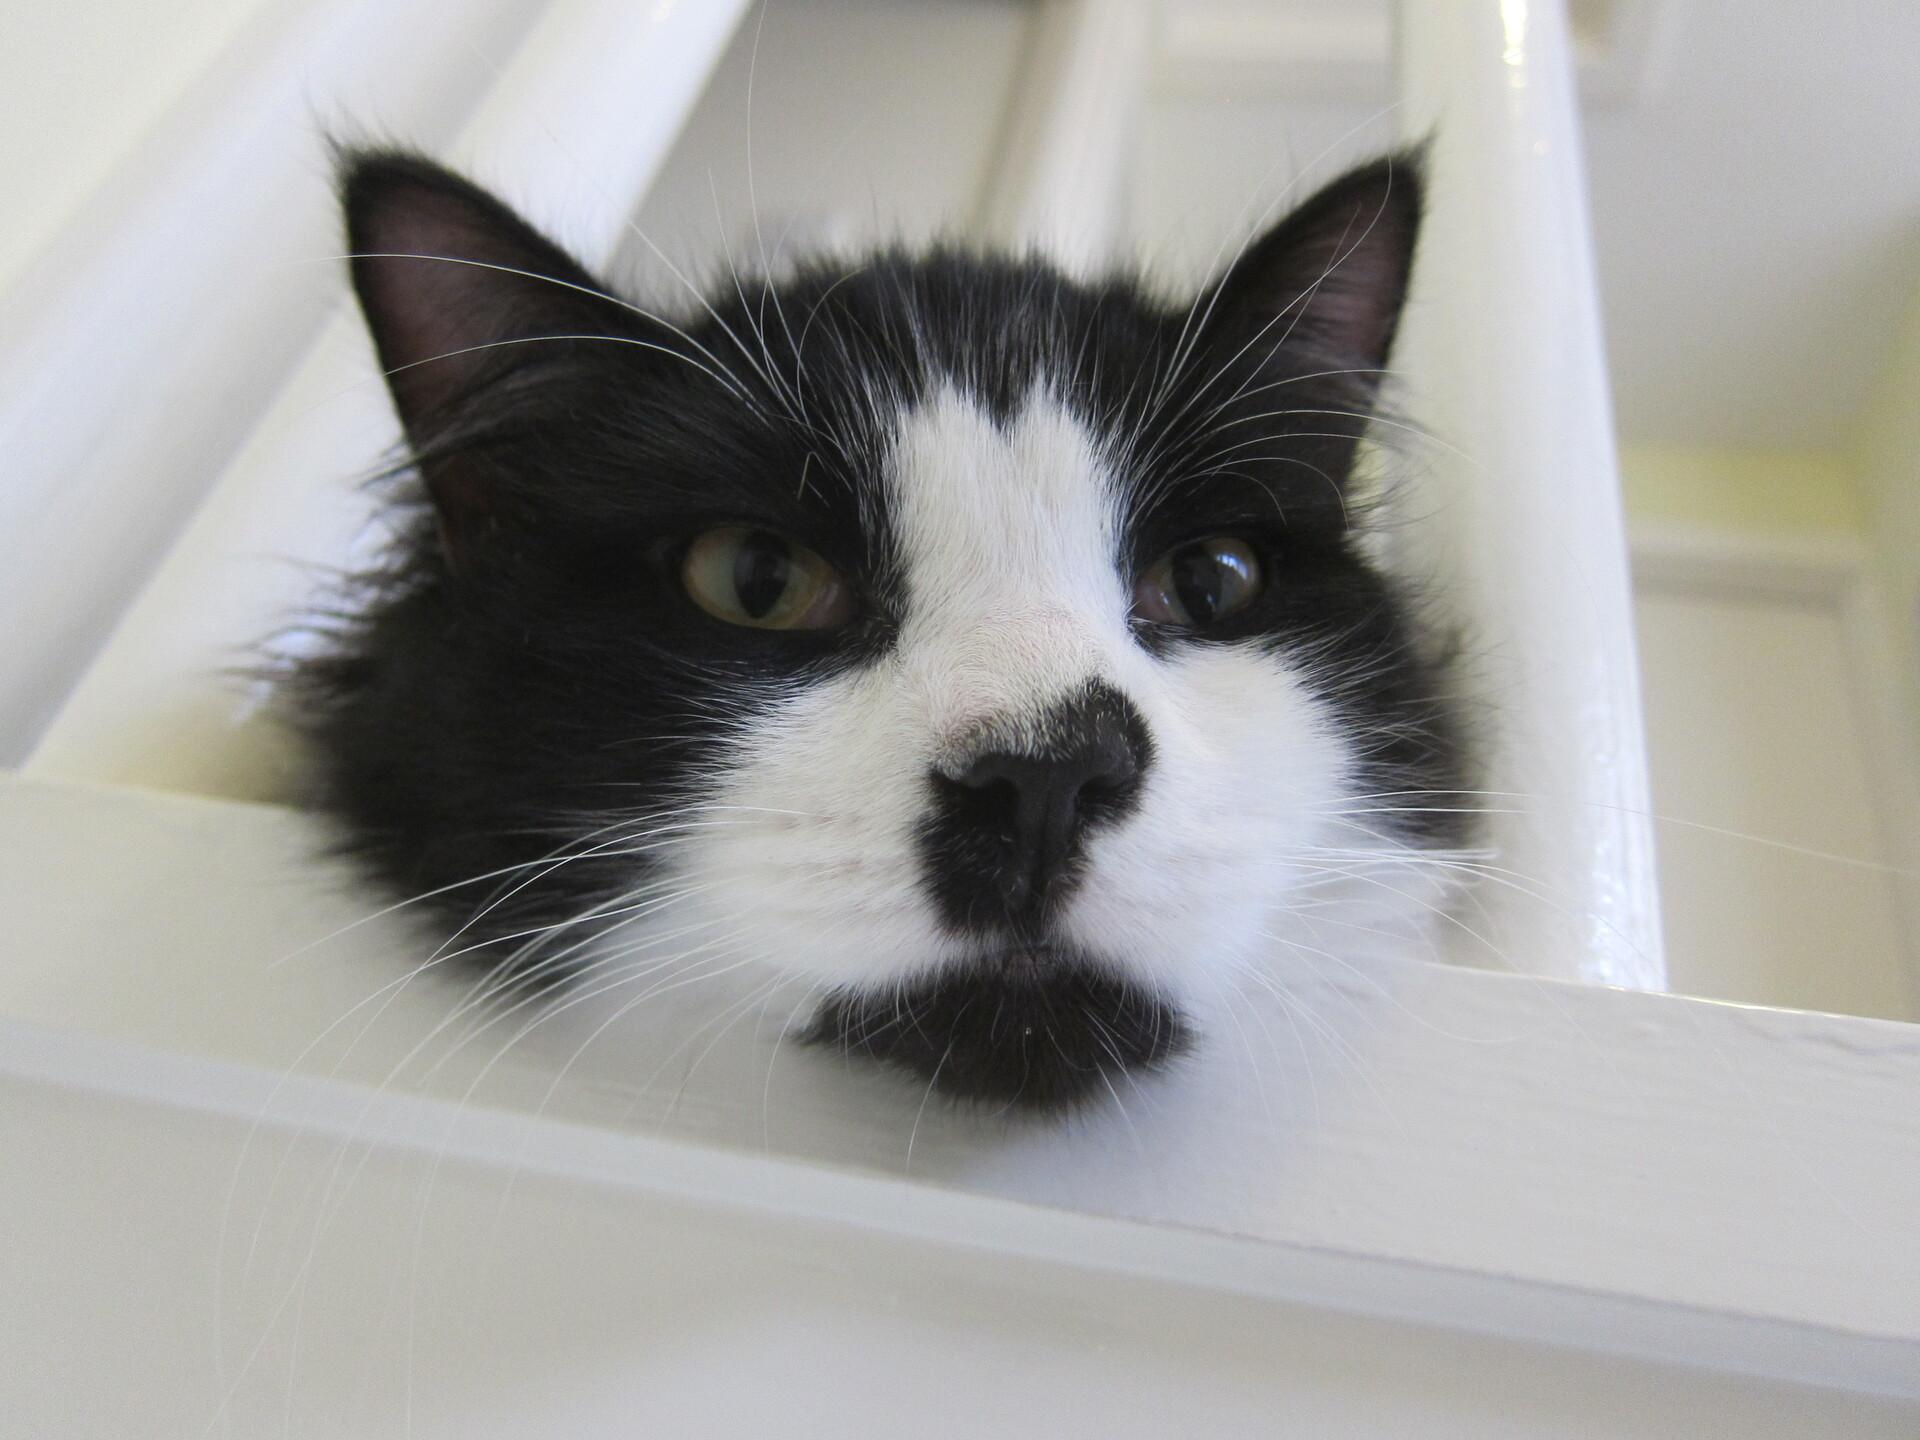 Felis silvestris (domestic cat) 'Mr Mittens' – Nov 2011